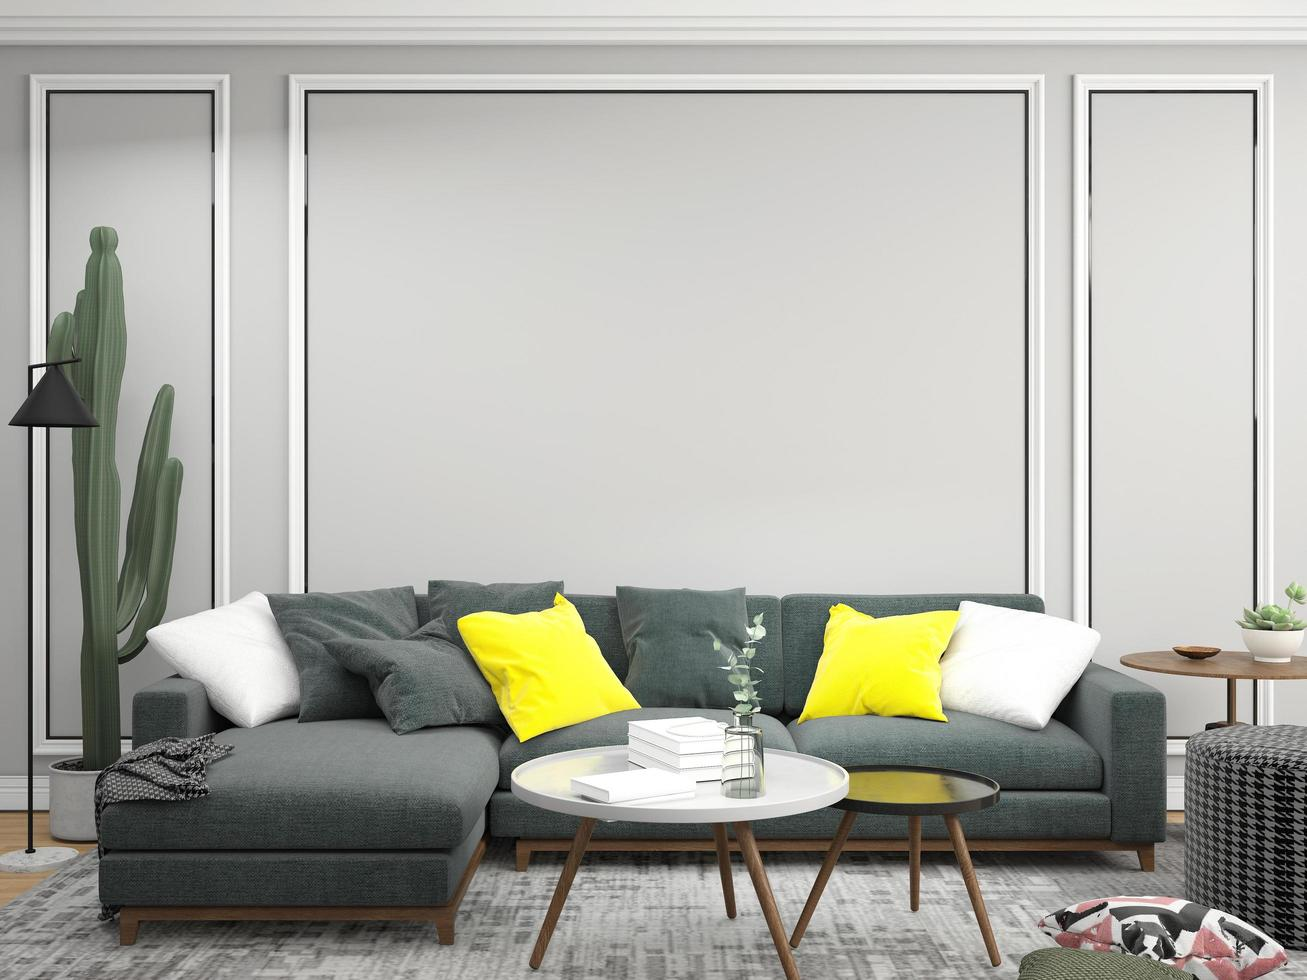 sala de estar contemporánea foto